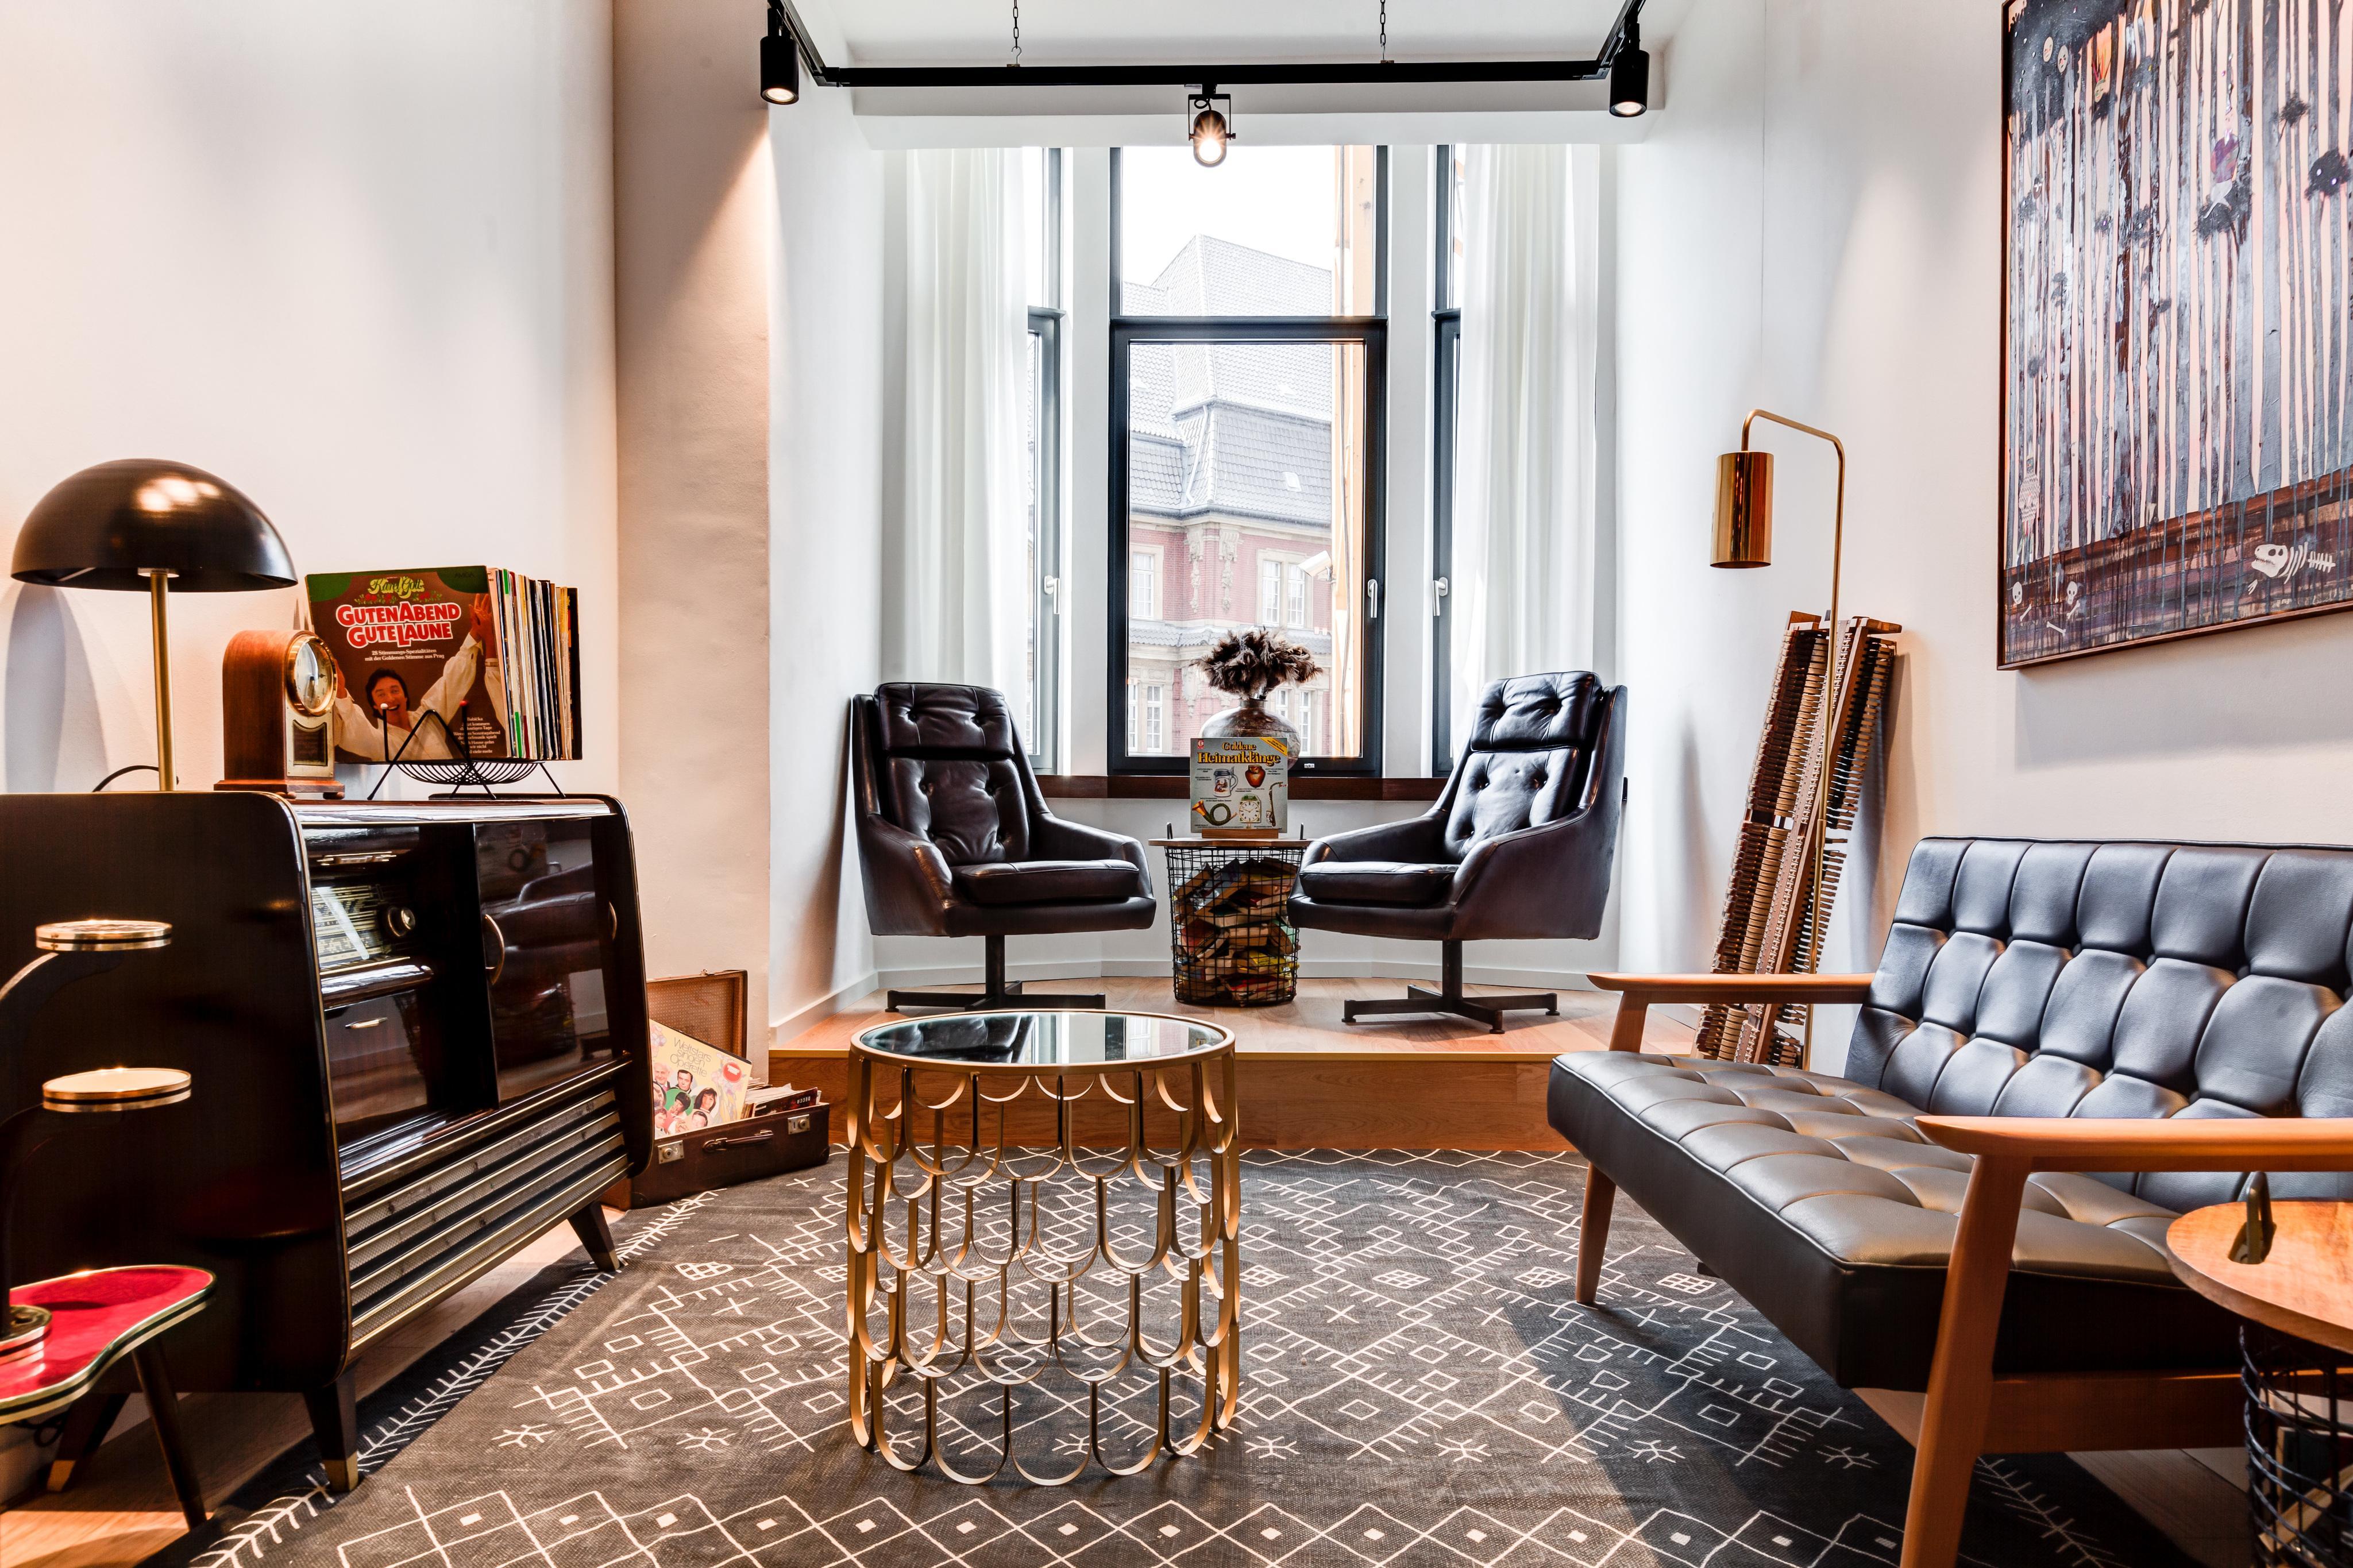 Arbeitszimmer Im Retro Stil Teppich Sessel Sofa